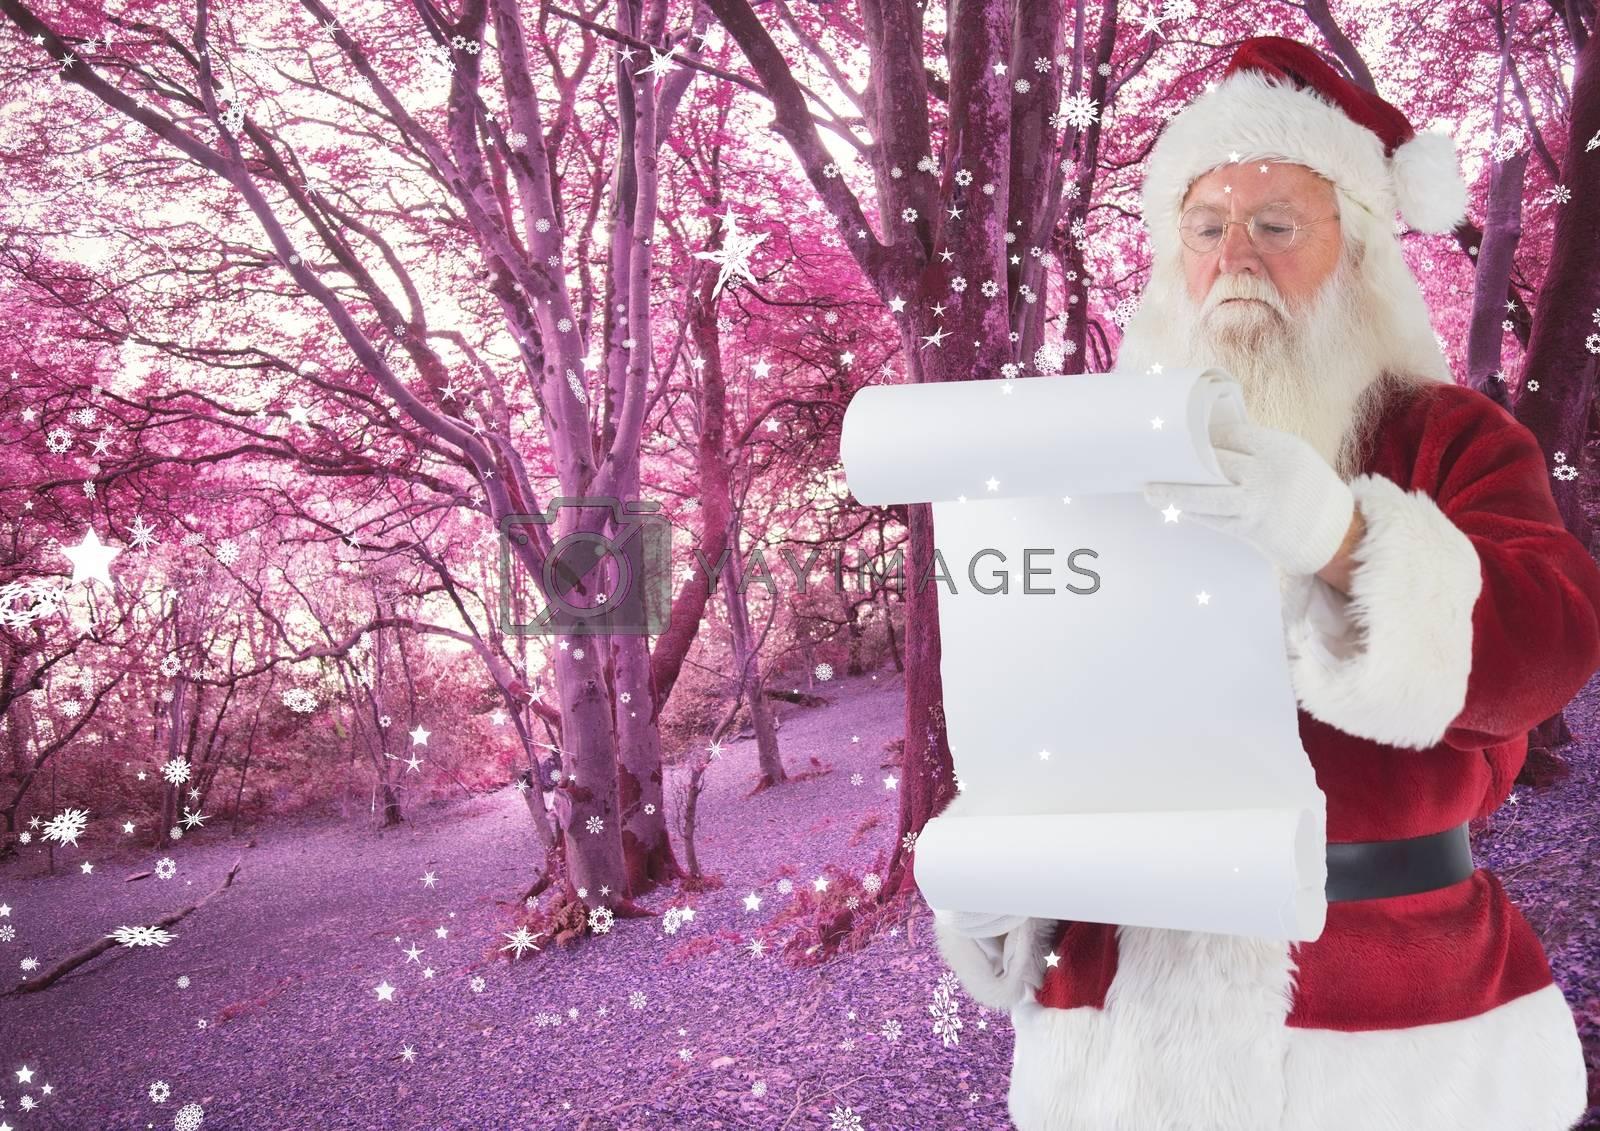 Santa claus holding checklist against pink forest background